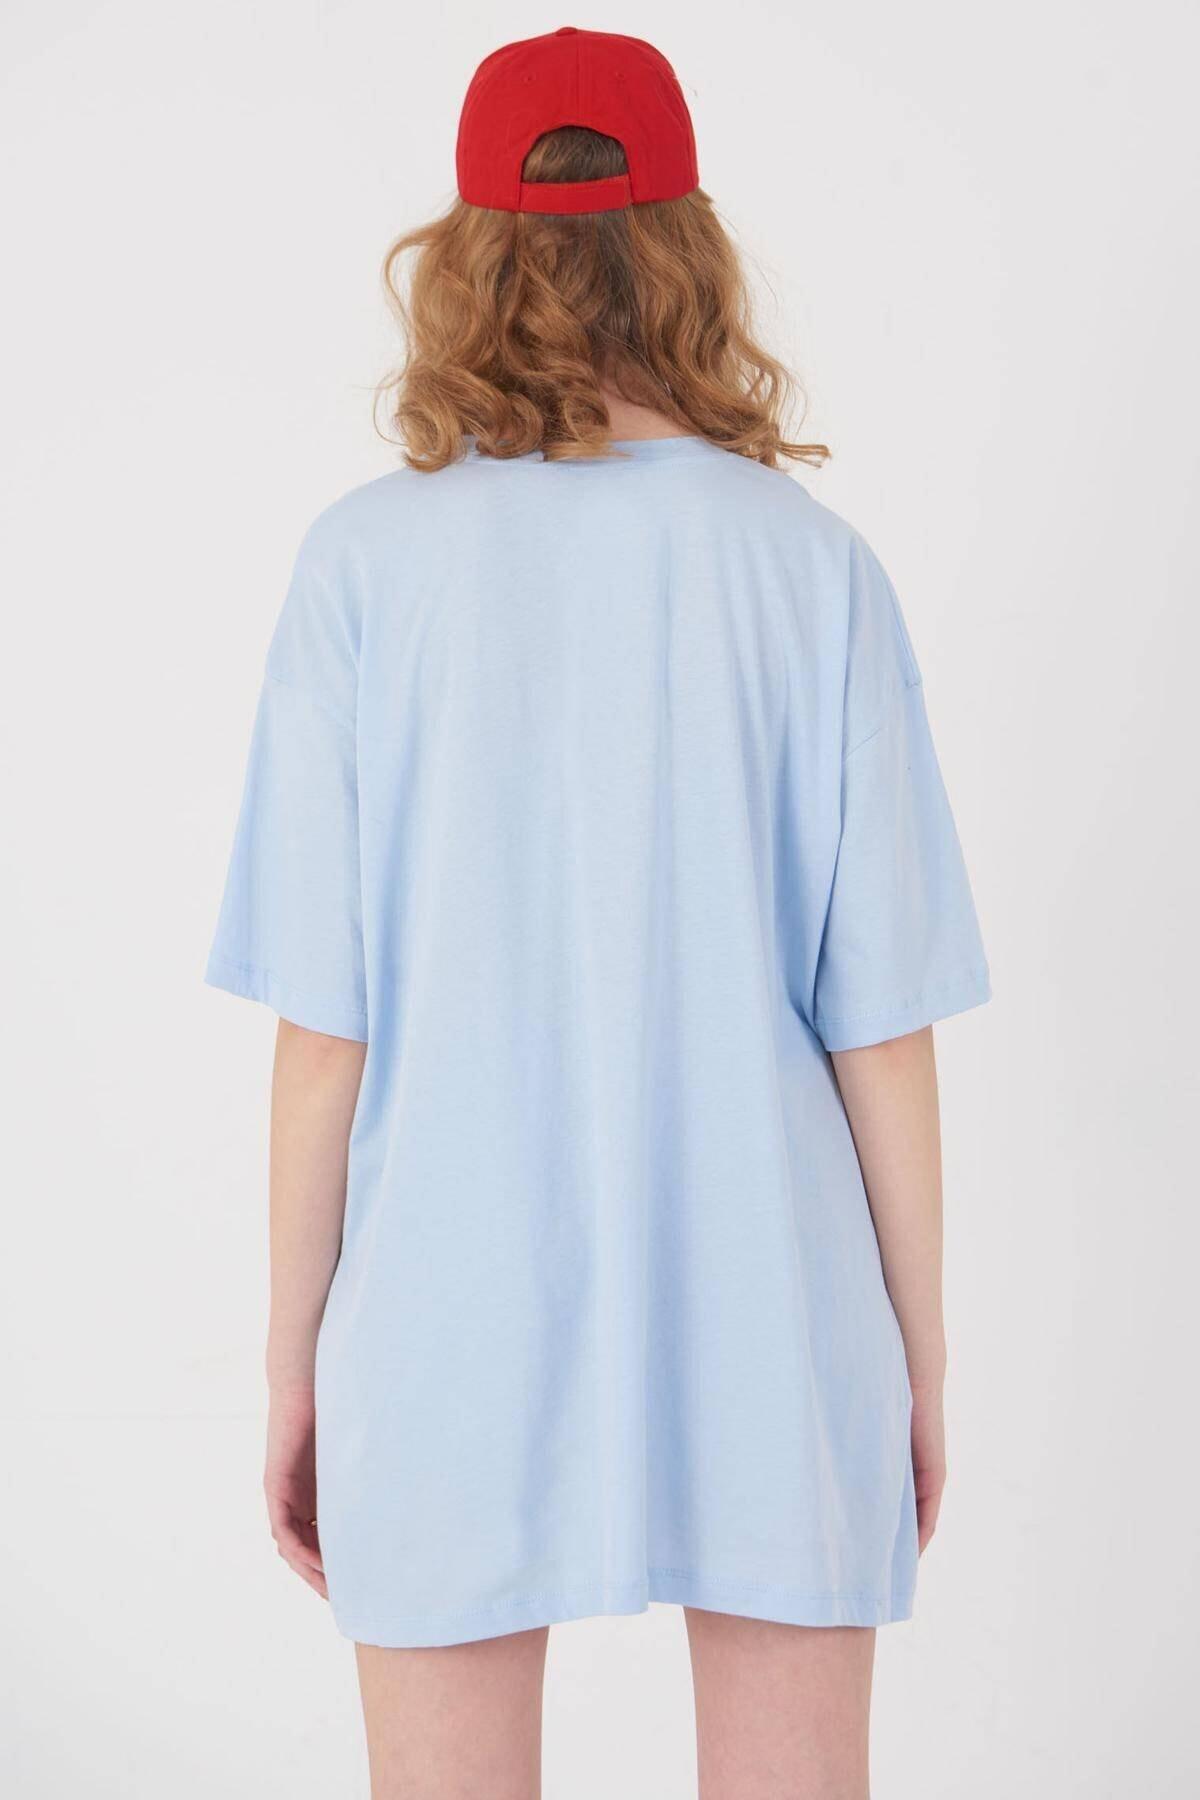 Addax Kadın Buz Mavi Oversize T-Shirt P0731 - G6K7 Adx-0000020596 4